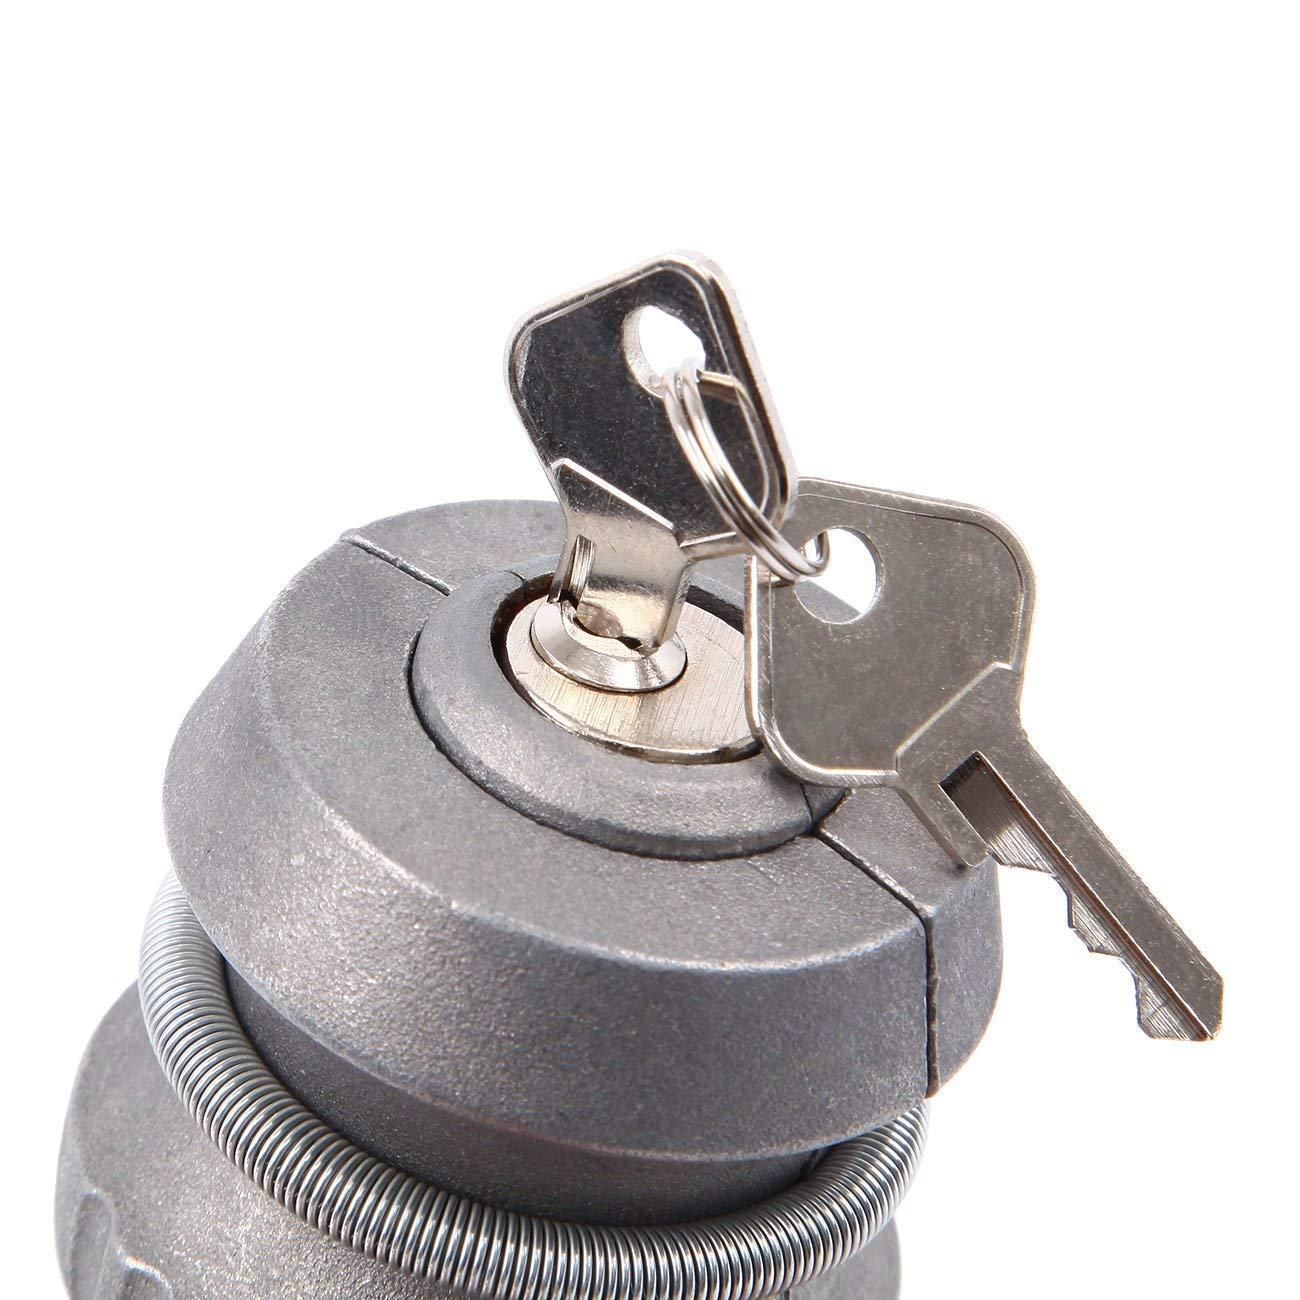 Security Anti-Theft Trailer Hitch Lock 50mm Dia Ball Coupling Universal Tow Ball Padlock Lock Zinc Alloy Caravan Lock for Caravan Trailer Silver